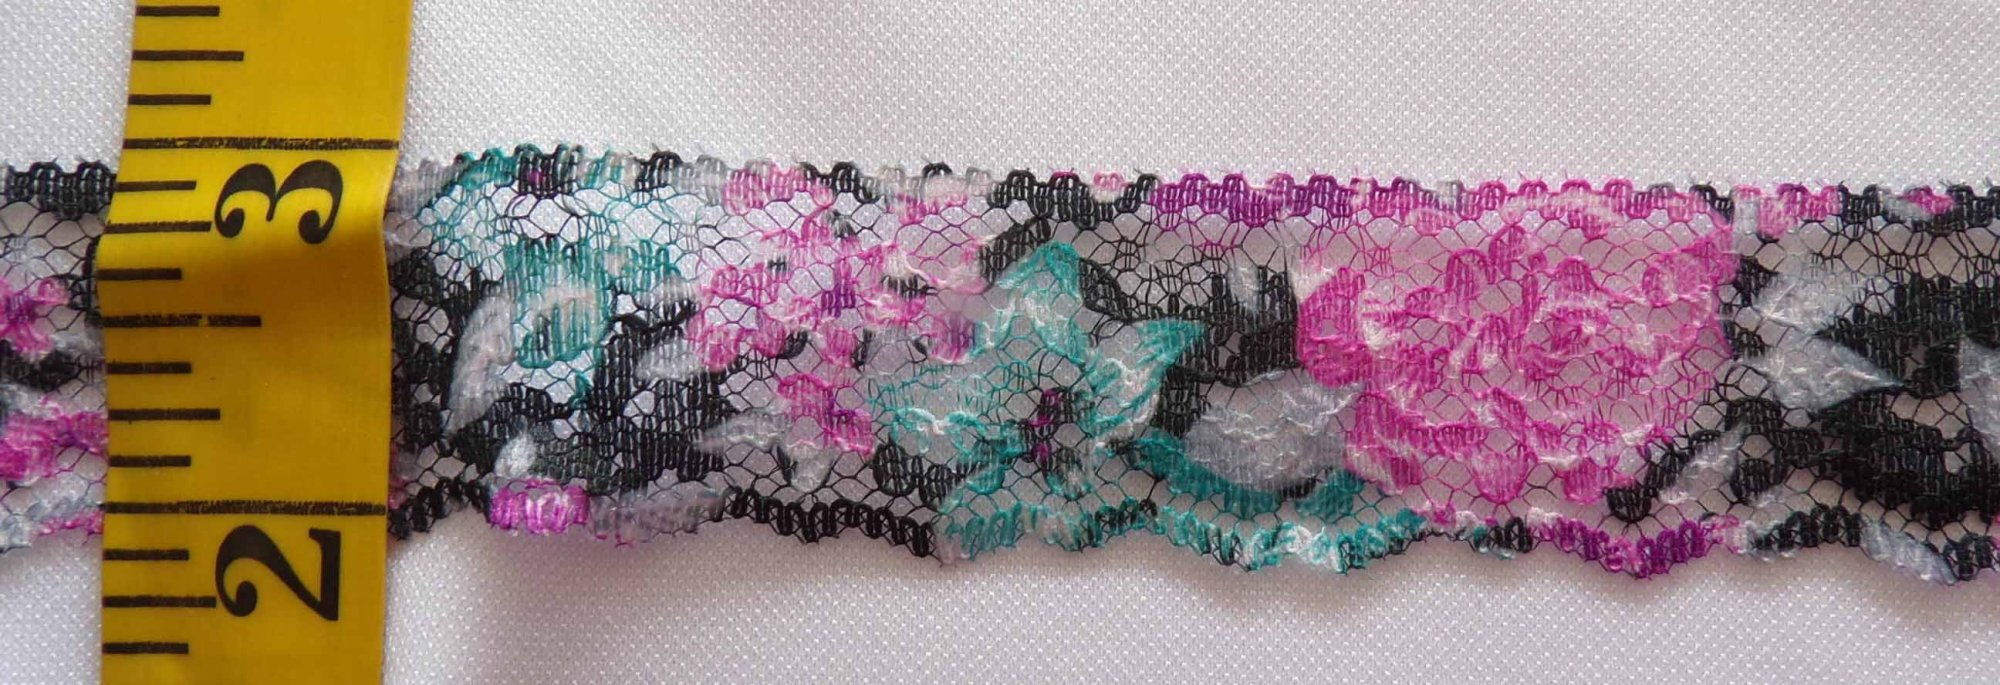 1 1/8 Rigid Lace - Fuschia, Teal, & Black Painted